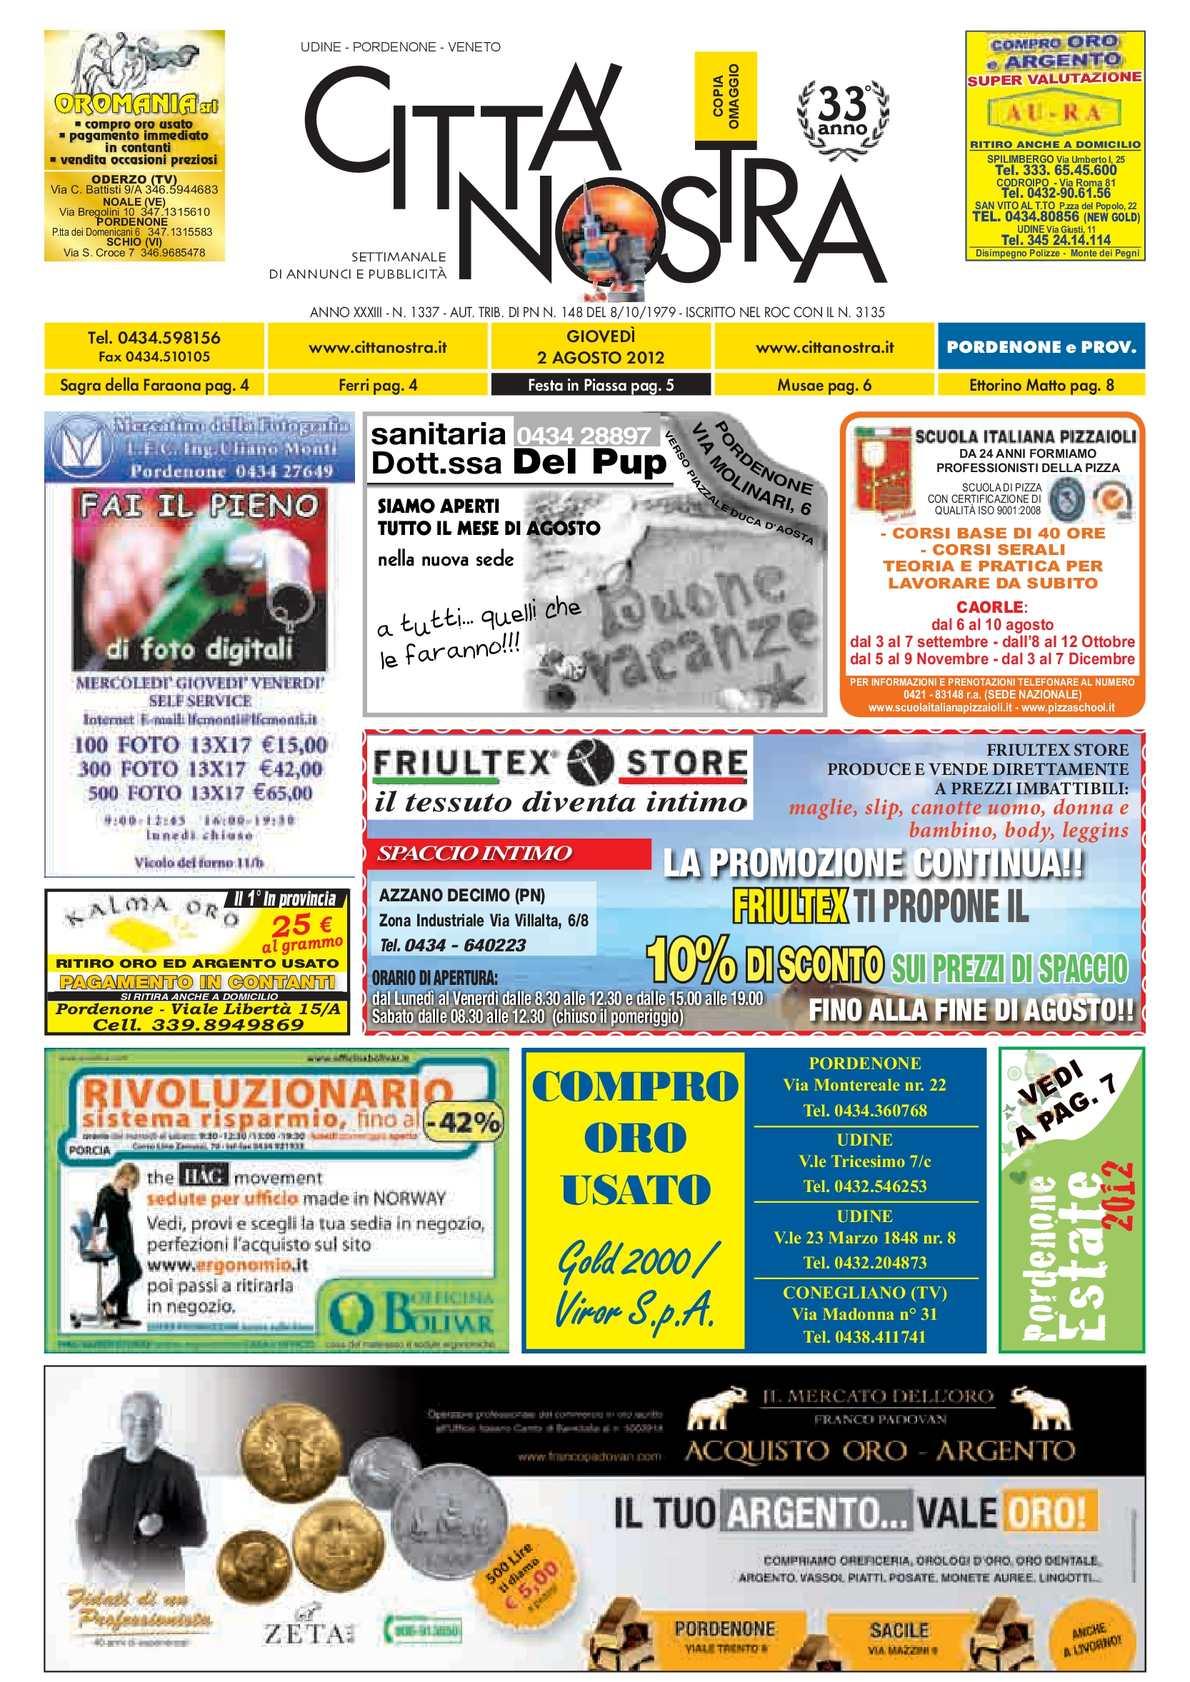 calaméo - città nostra pordenone del 02.08.2012 n. 1337 - Gazebo Unico Progetta Impresa Stecca Balaustra